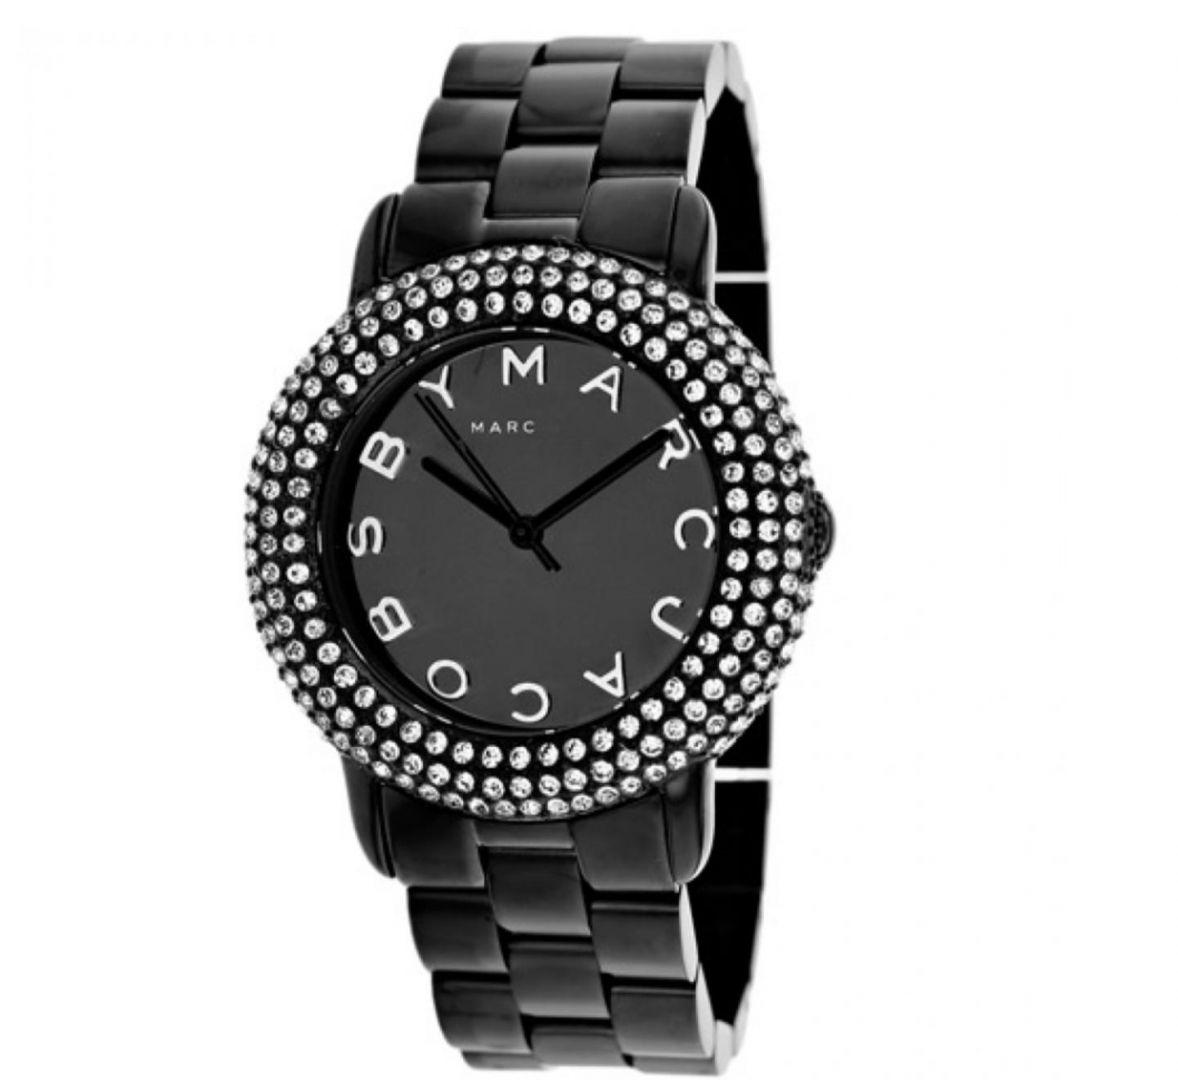 שעון יד אנלוגי mark jacobs דגם: mbm3193 מארק ג'ייקובס